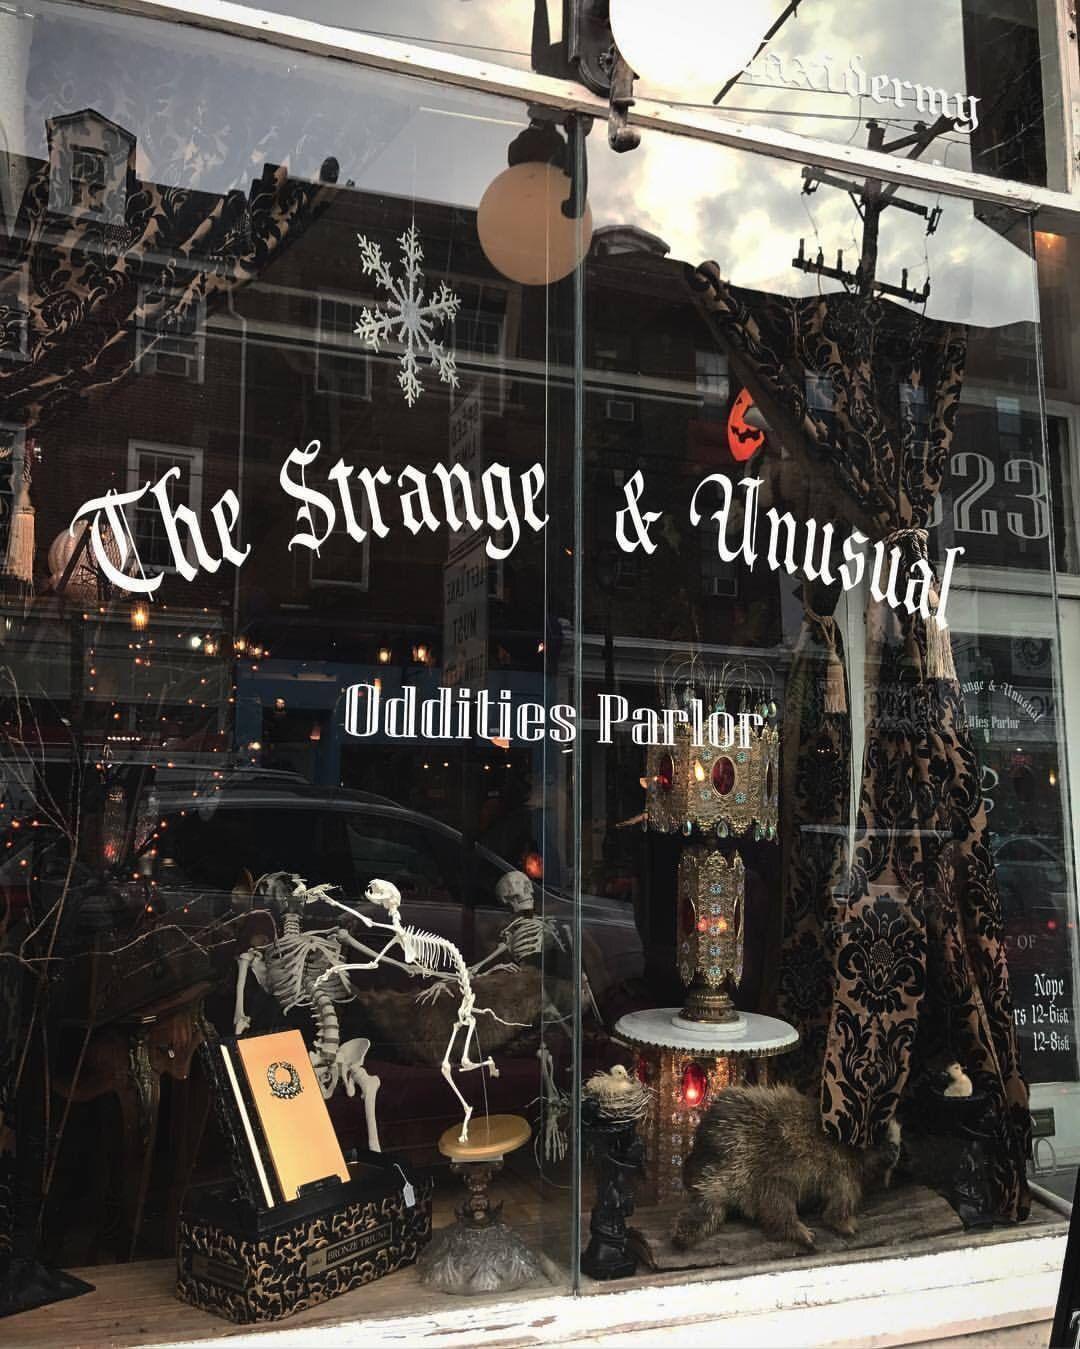 The Strange & Unusual Oddities Parlor   Kingston, Pennsylvania #halloweenaesthetic